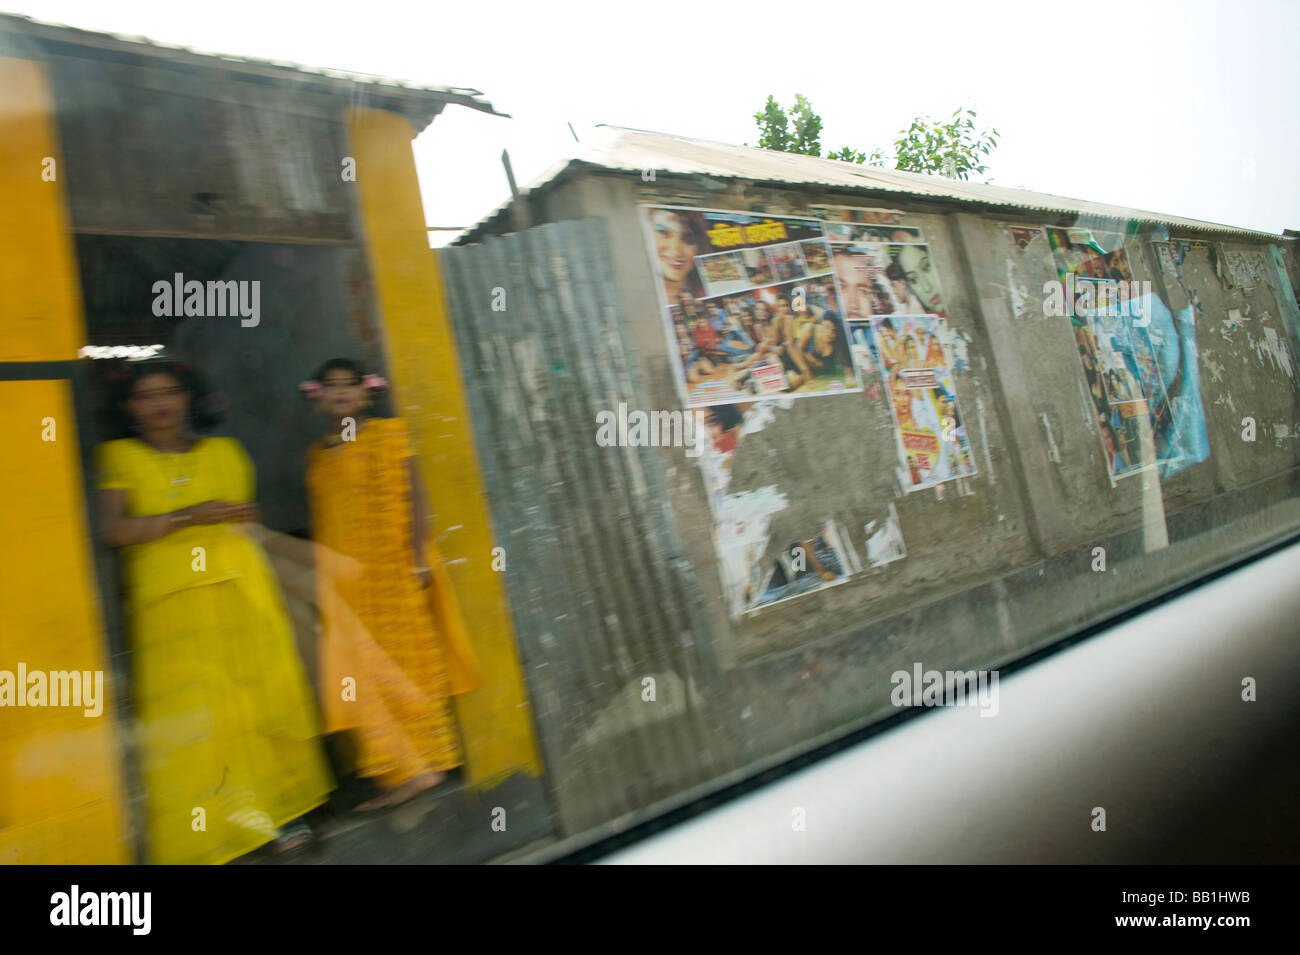 Passing by brothel in car, Tangail, Bangladesh. - Stock Image